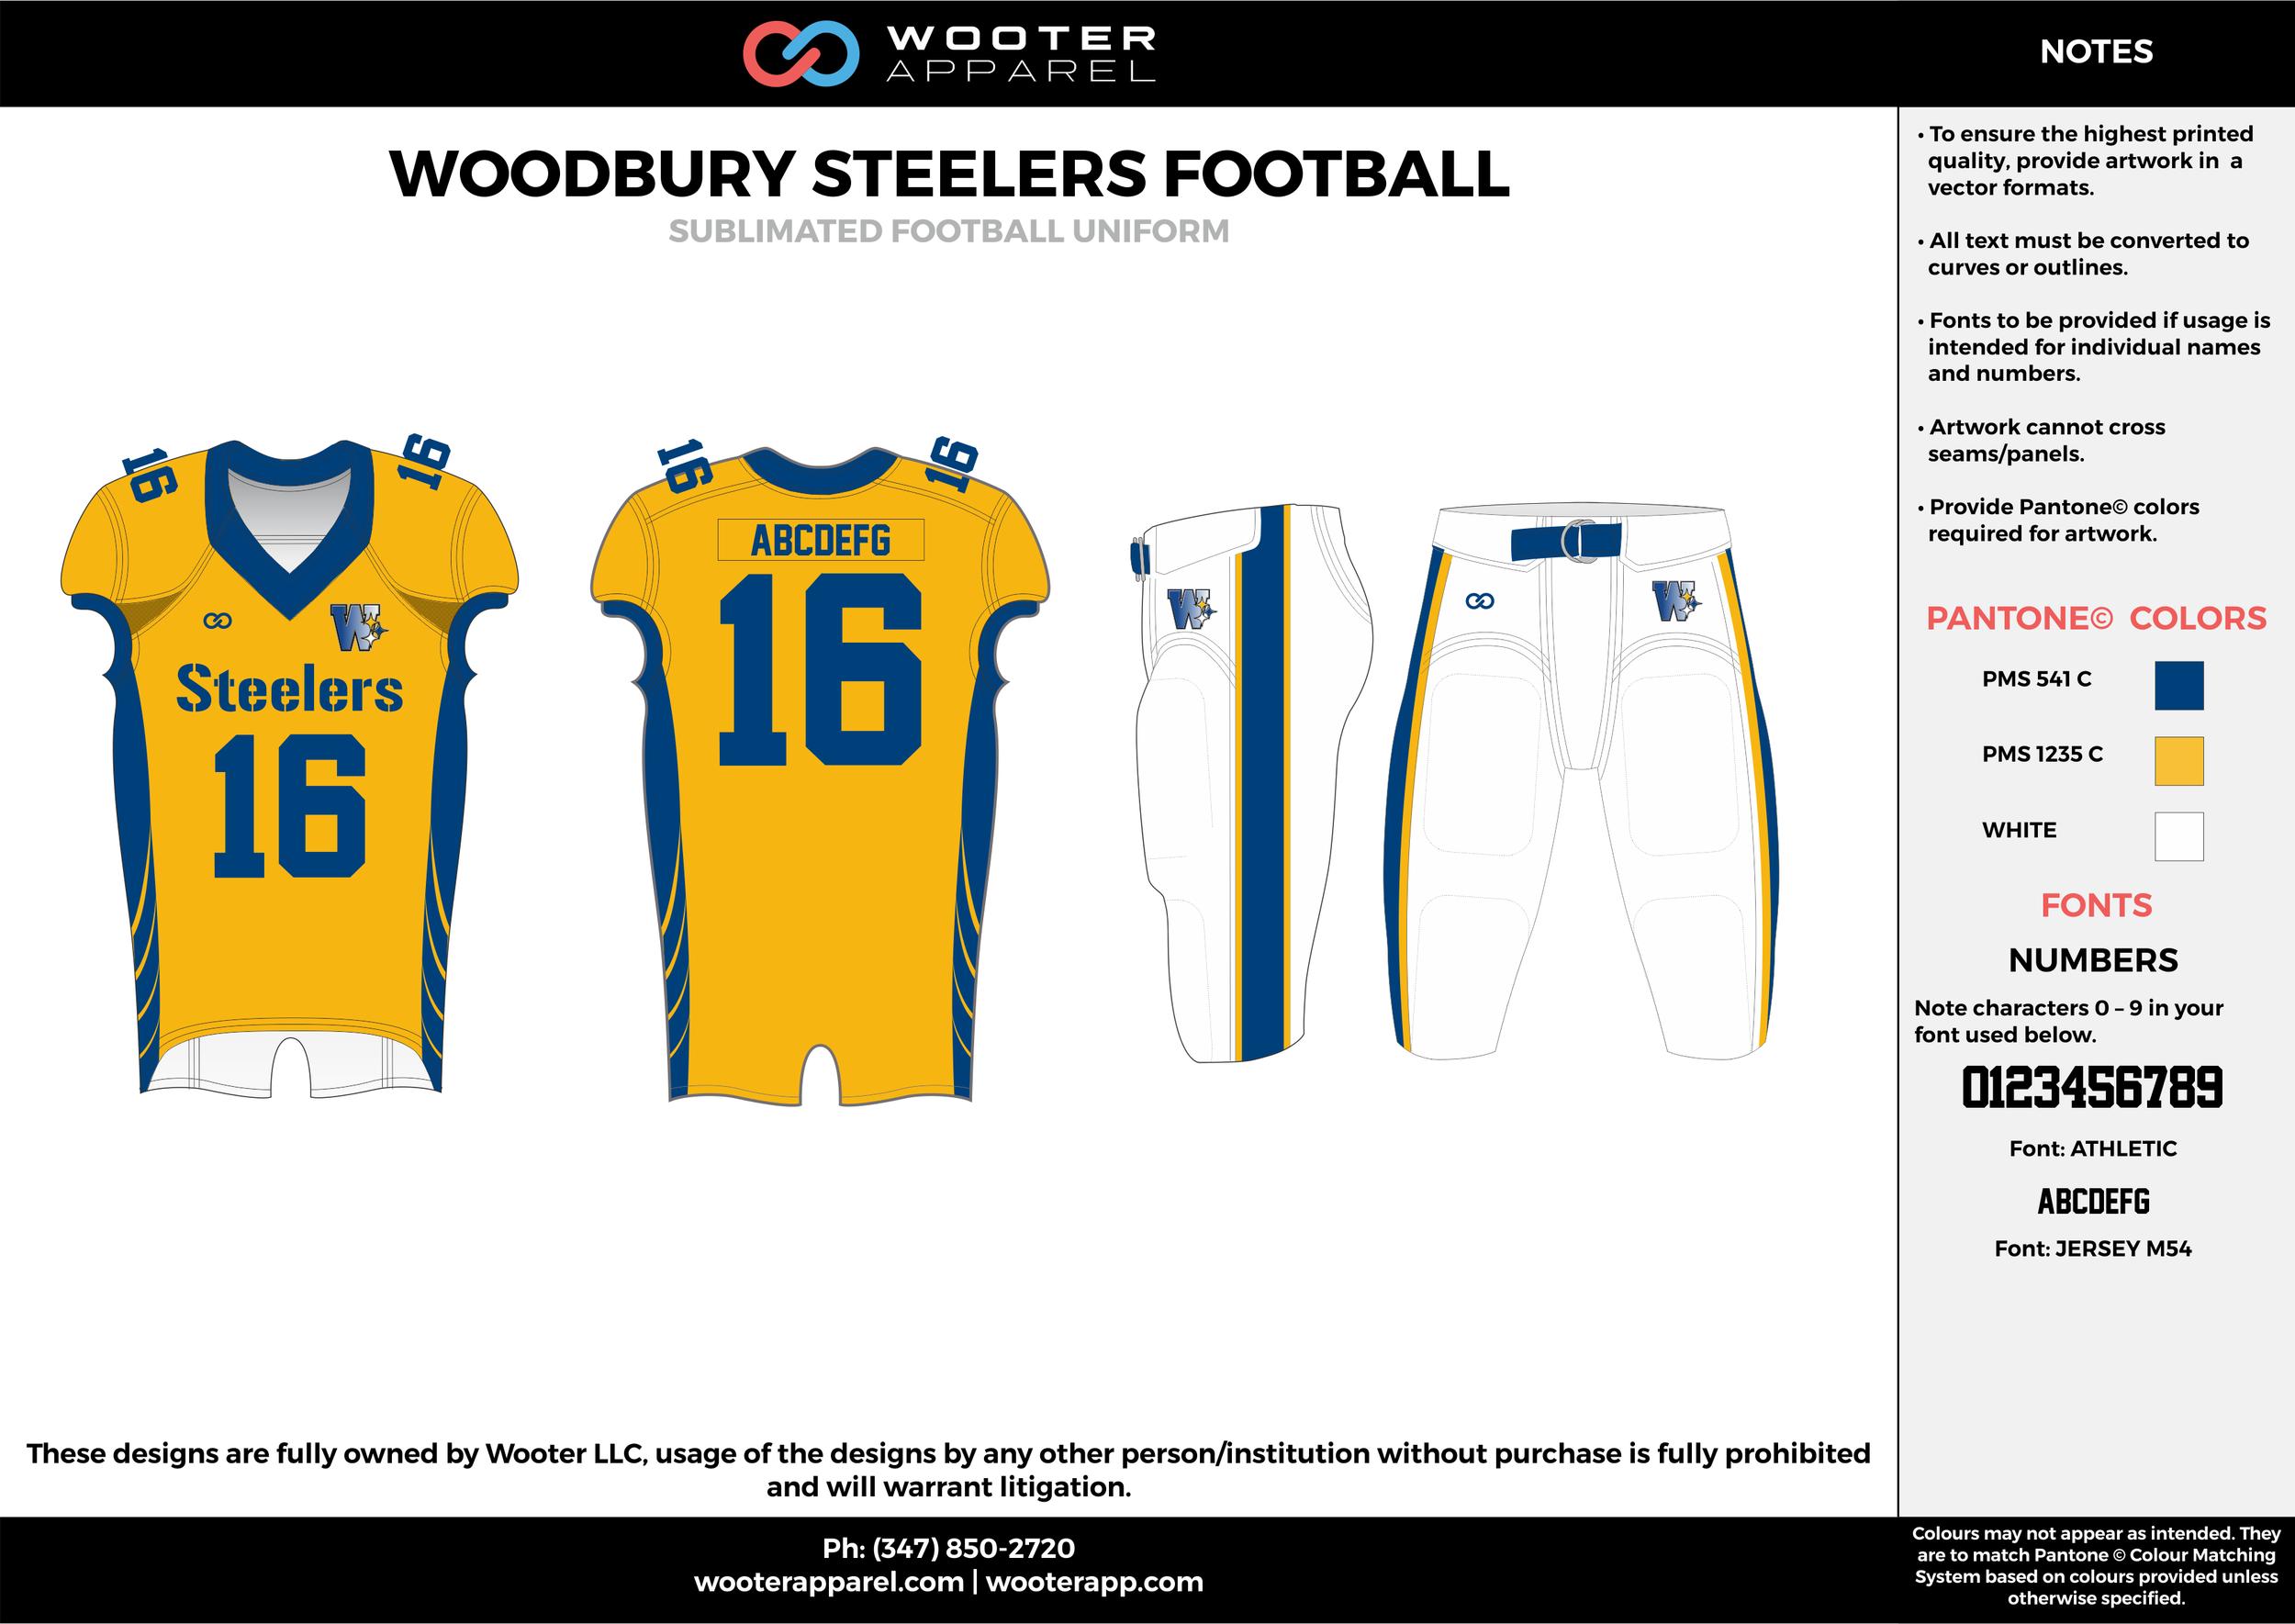 WOODBURY STEELERS FOOTBALL yellow white blue football uniforms jerseys pants